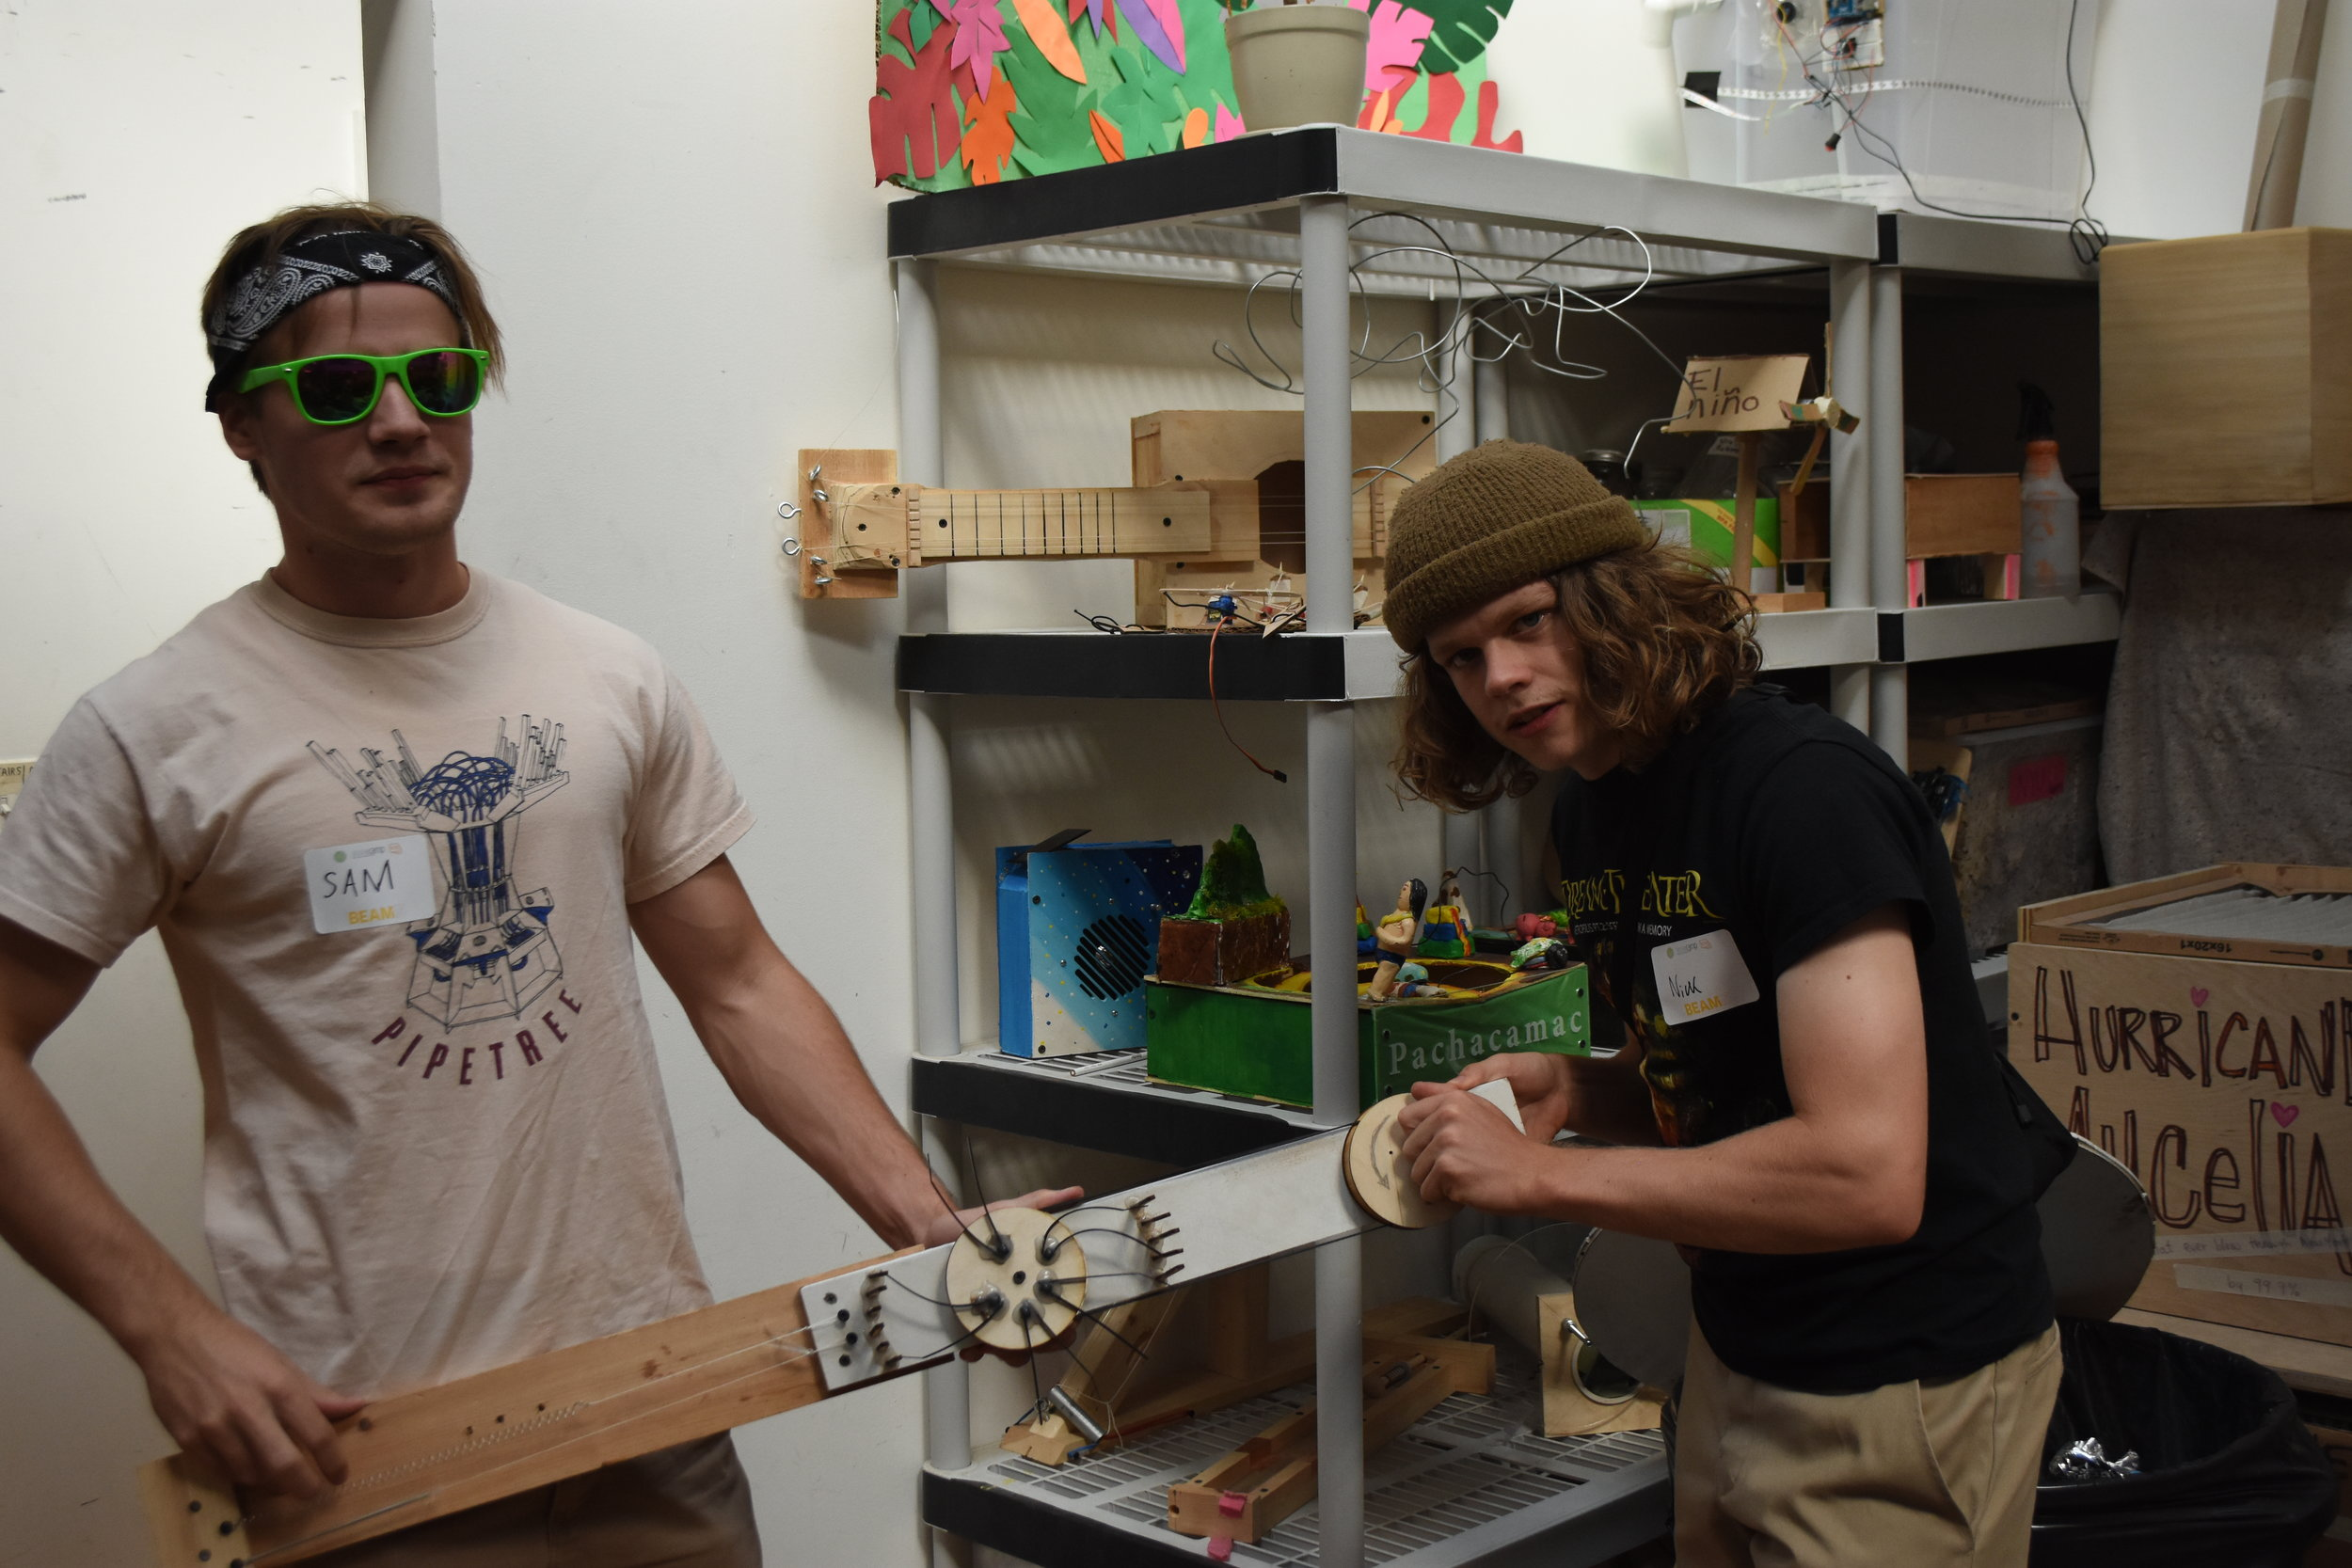 Sam & nick prototypes.JPG